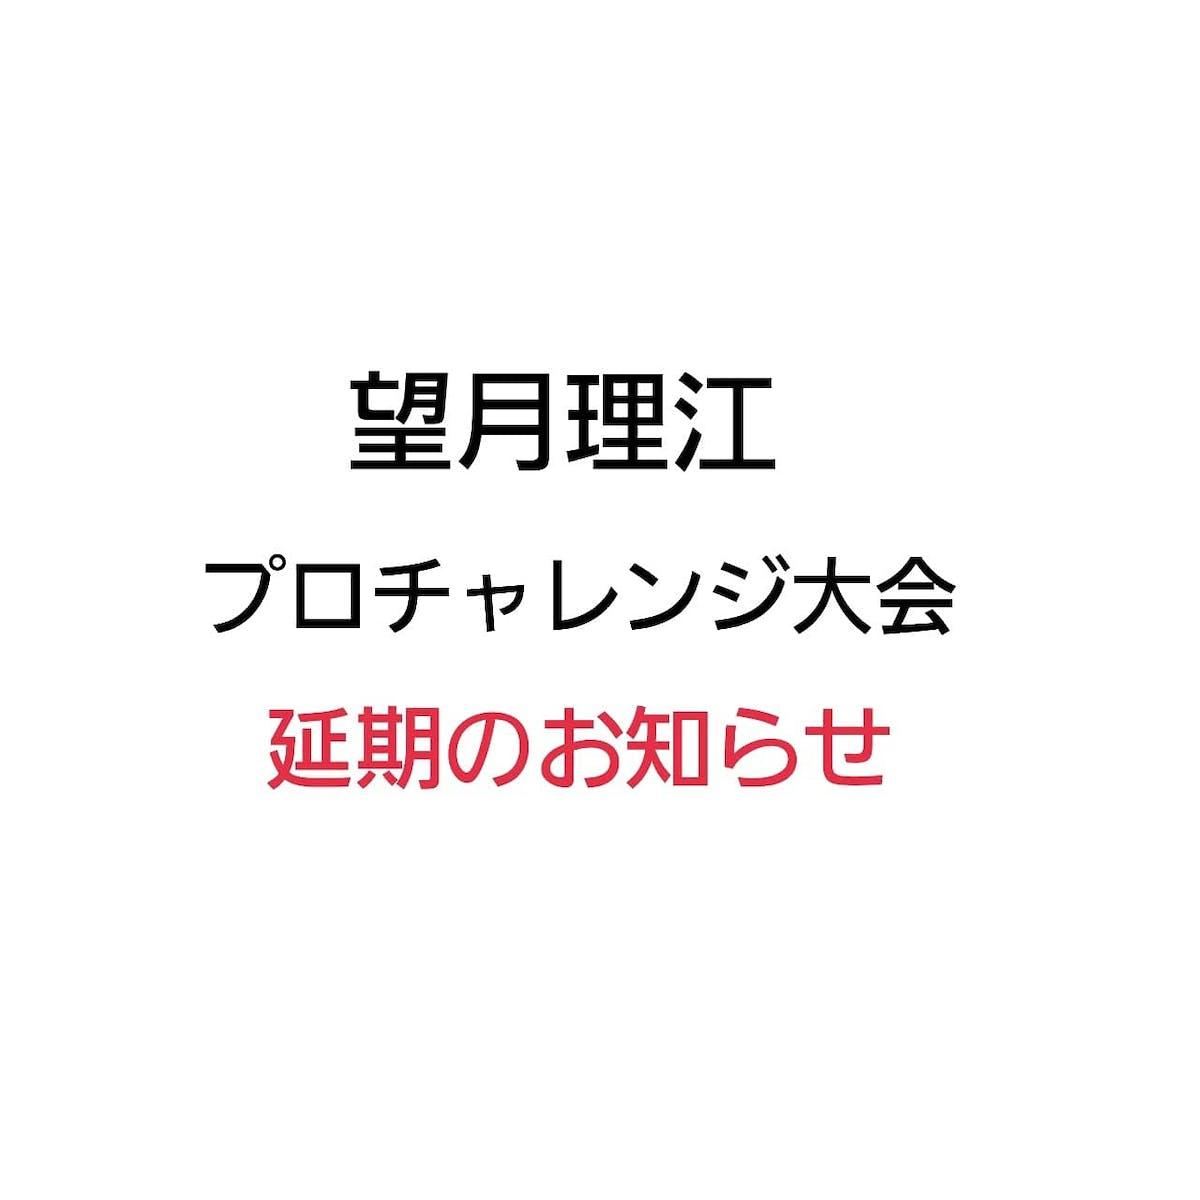 IMG_20210508_222613_972.jpg